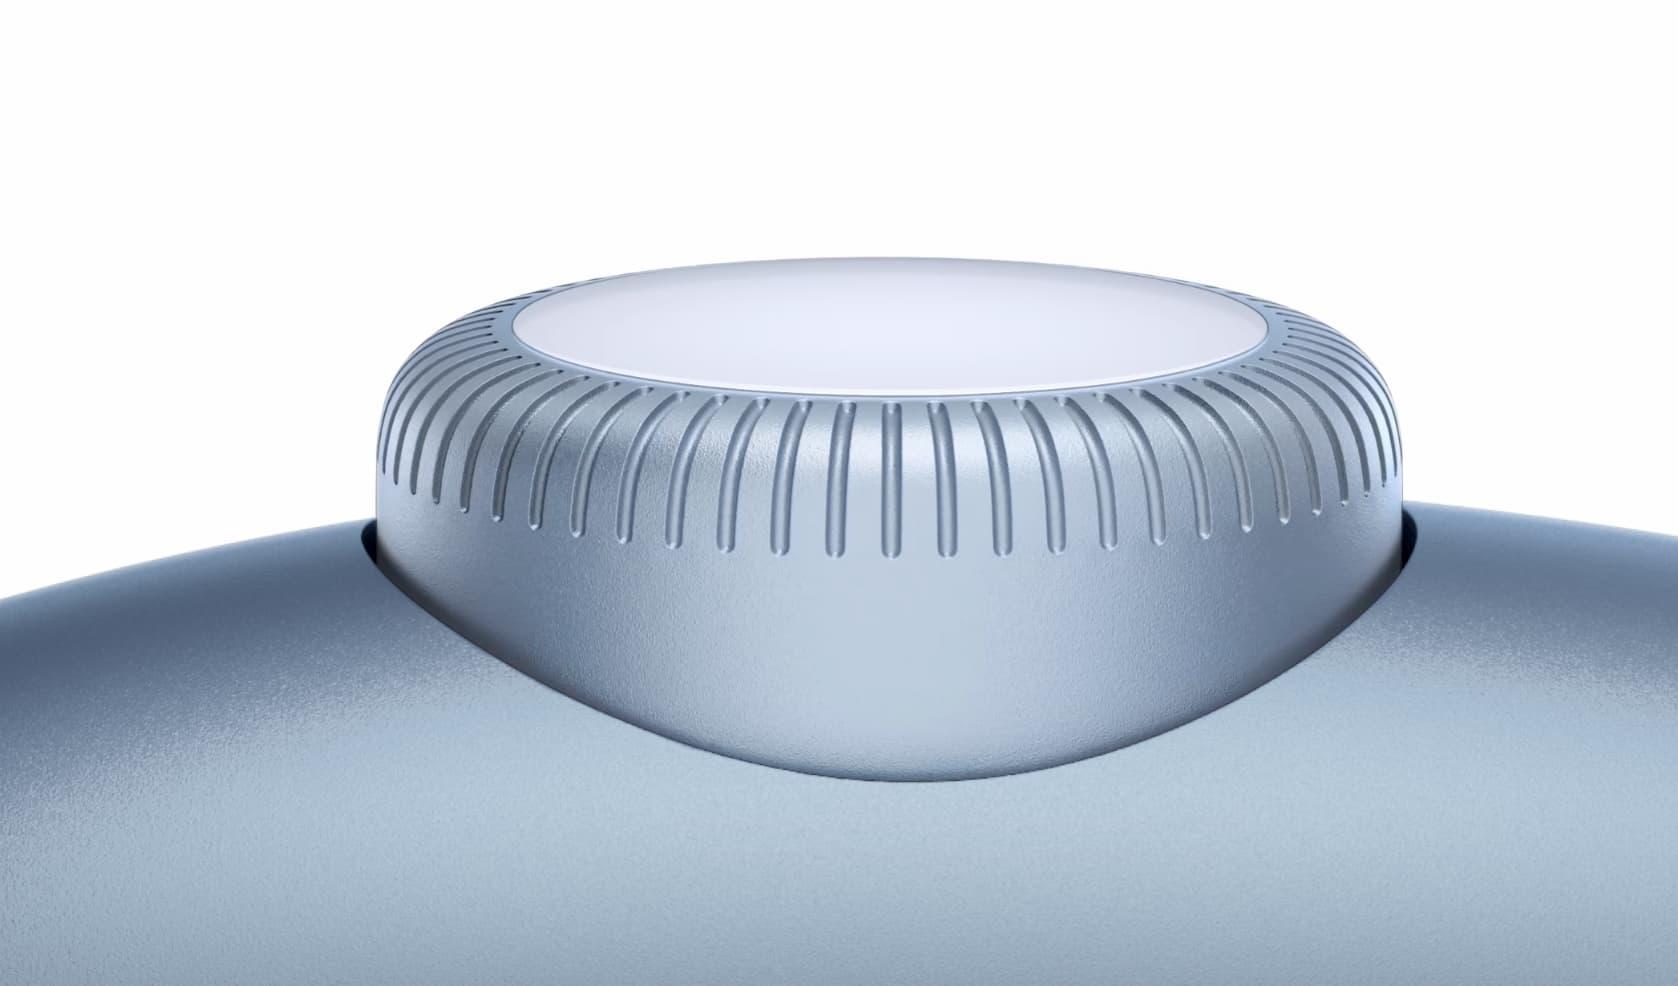 AirPods Max 外觀設計5